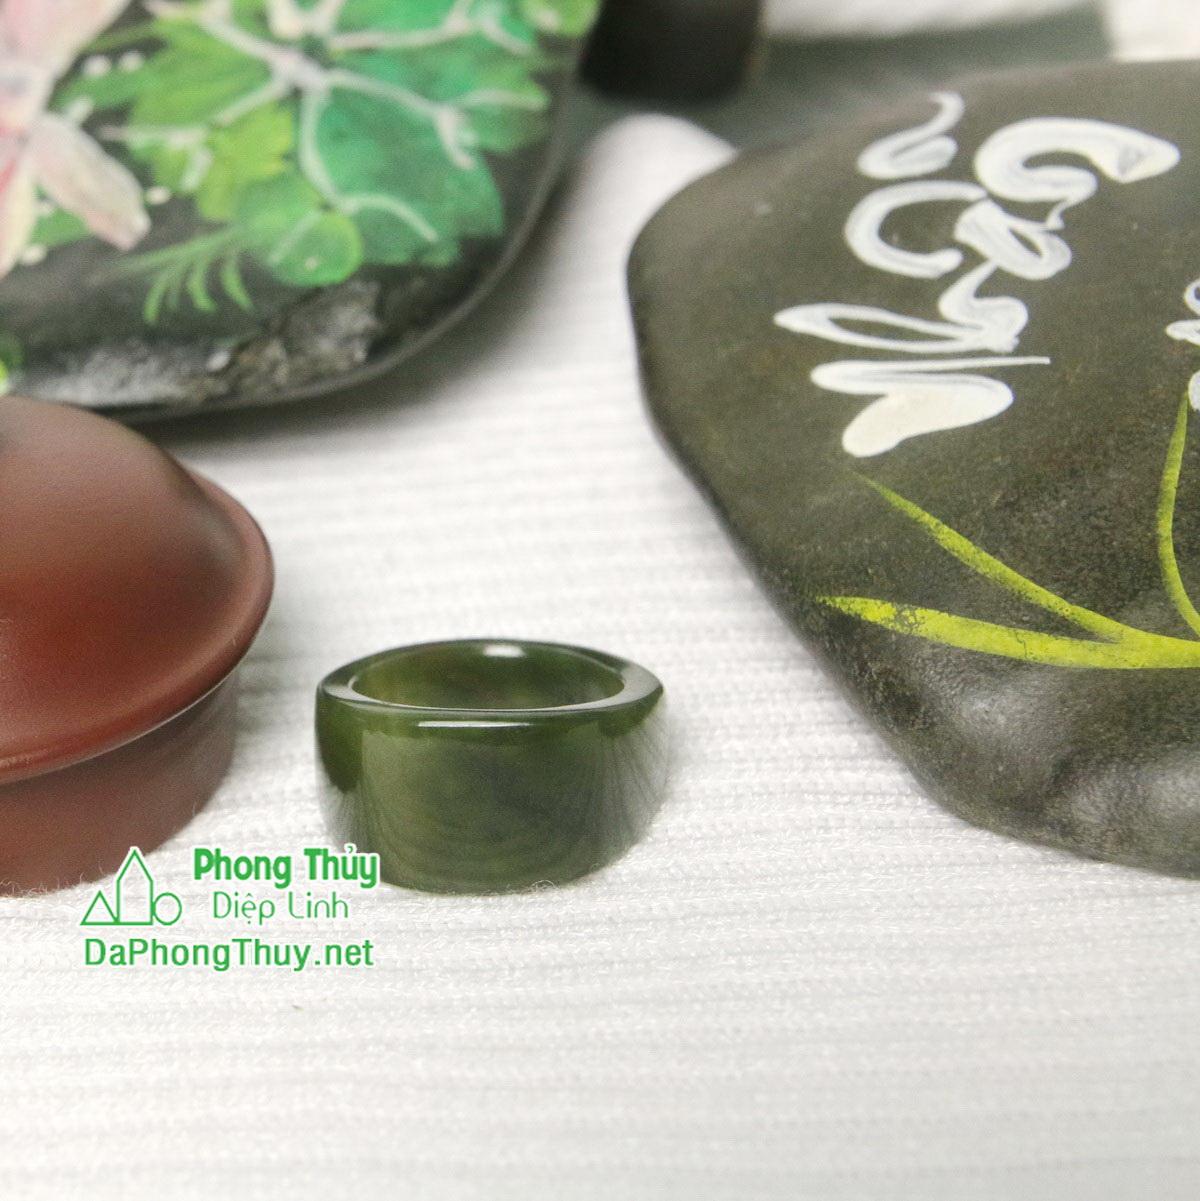 Nhan ngoc bich nephrite jade